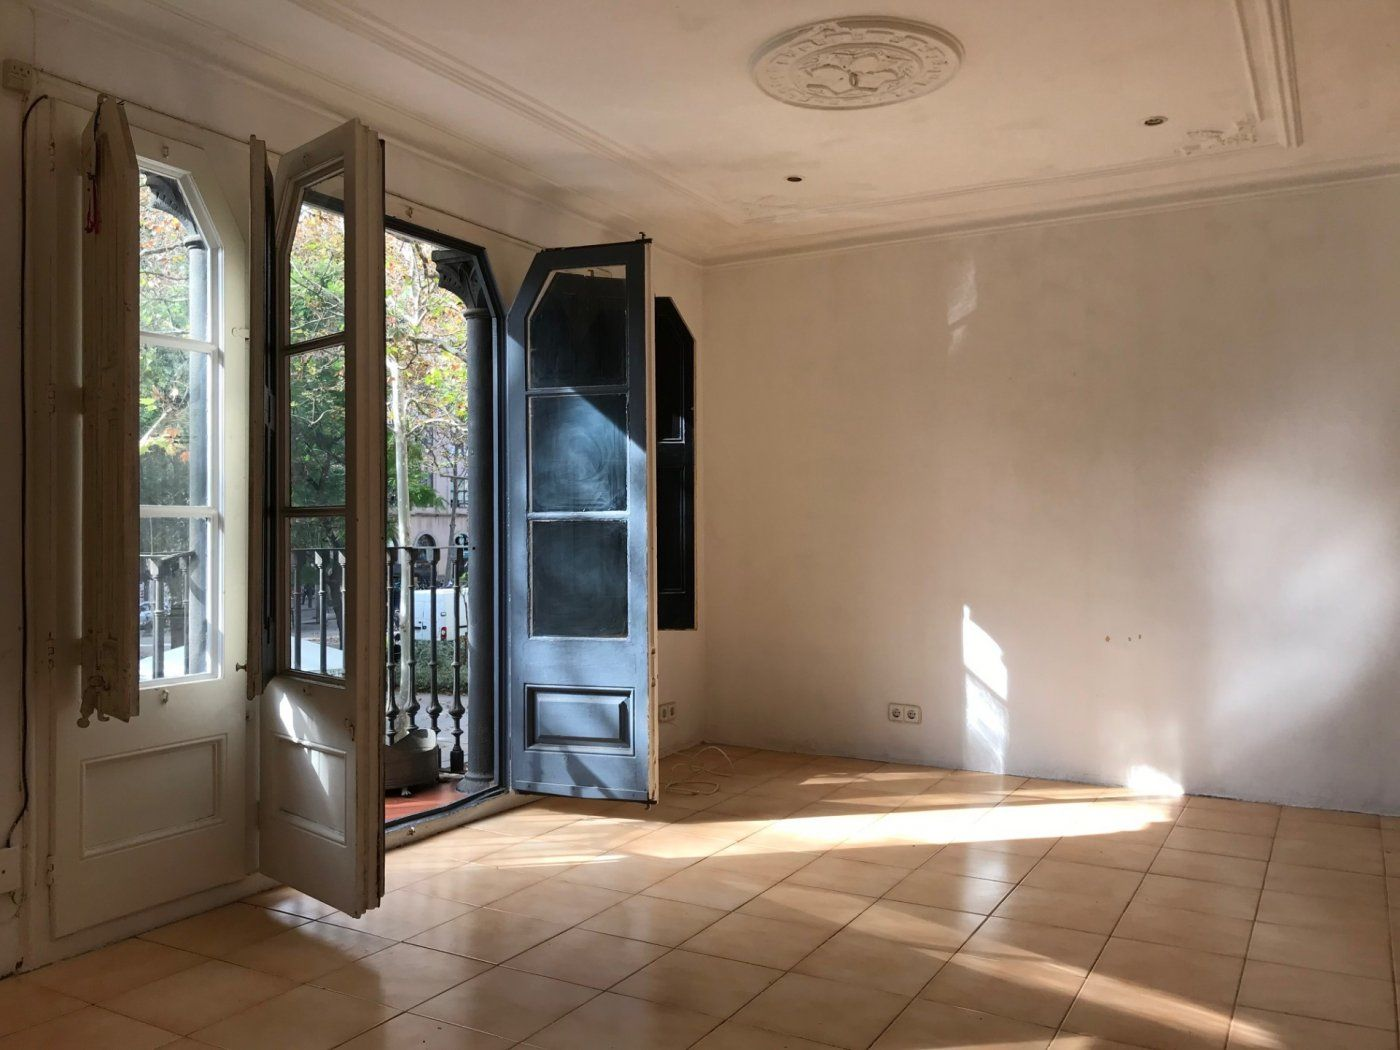 (Español) Precioso piso estilo antiguo en Rambla raval